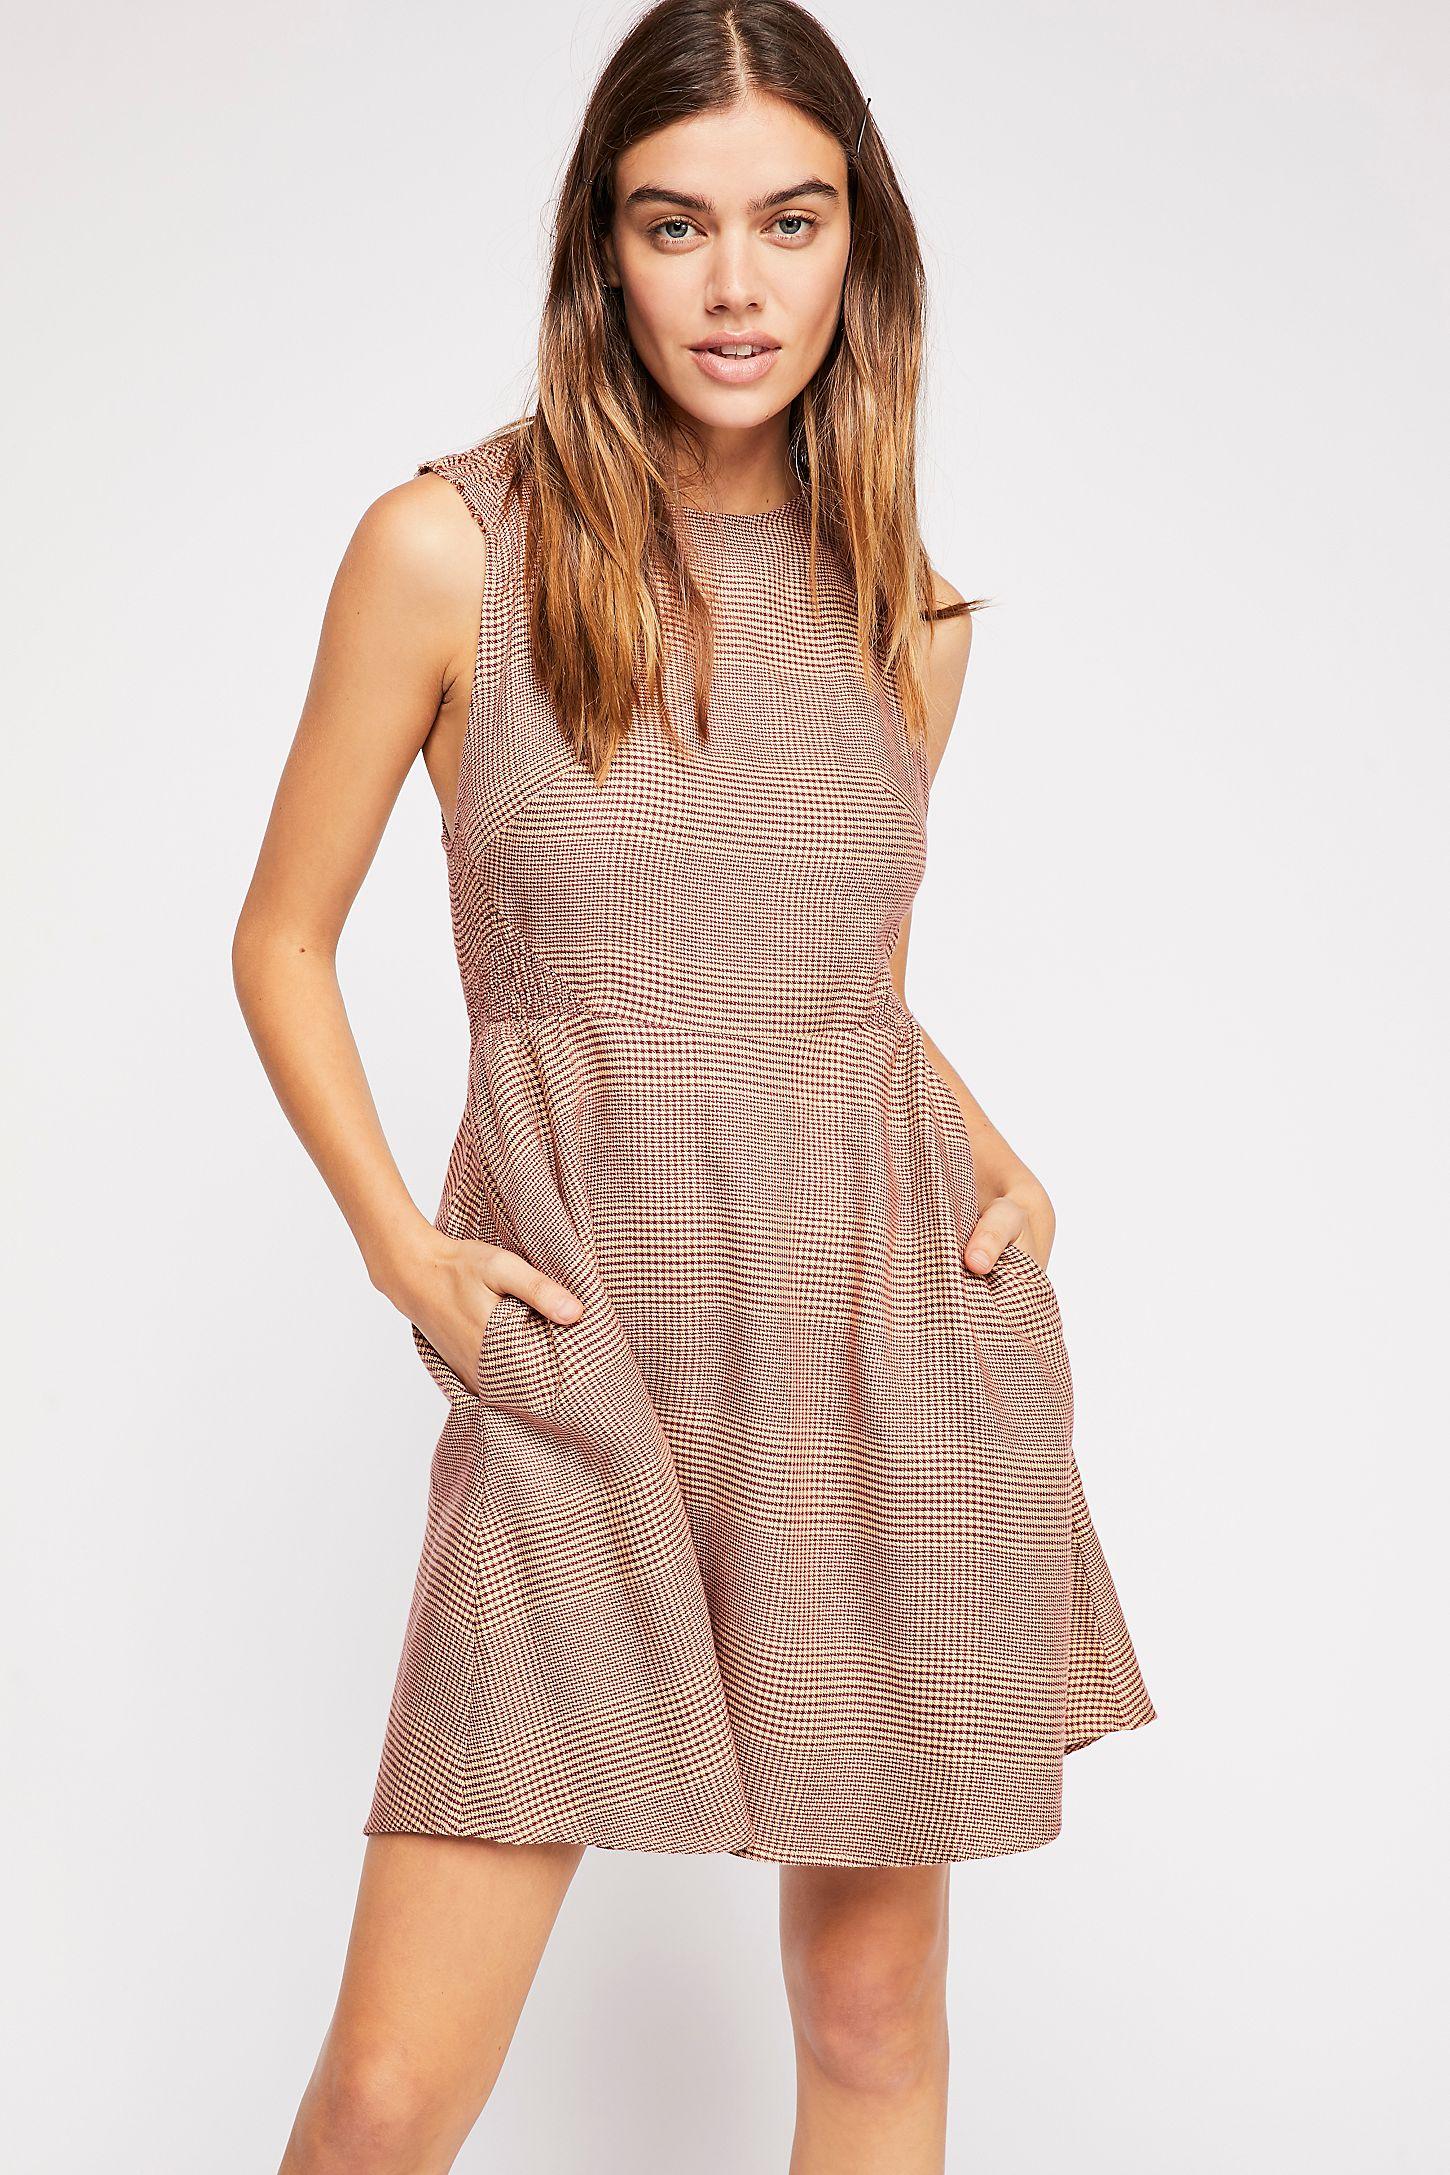 Au Revoir Mini Dress Free People